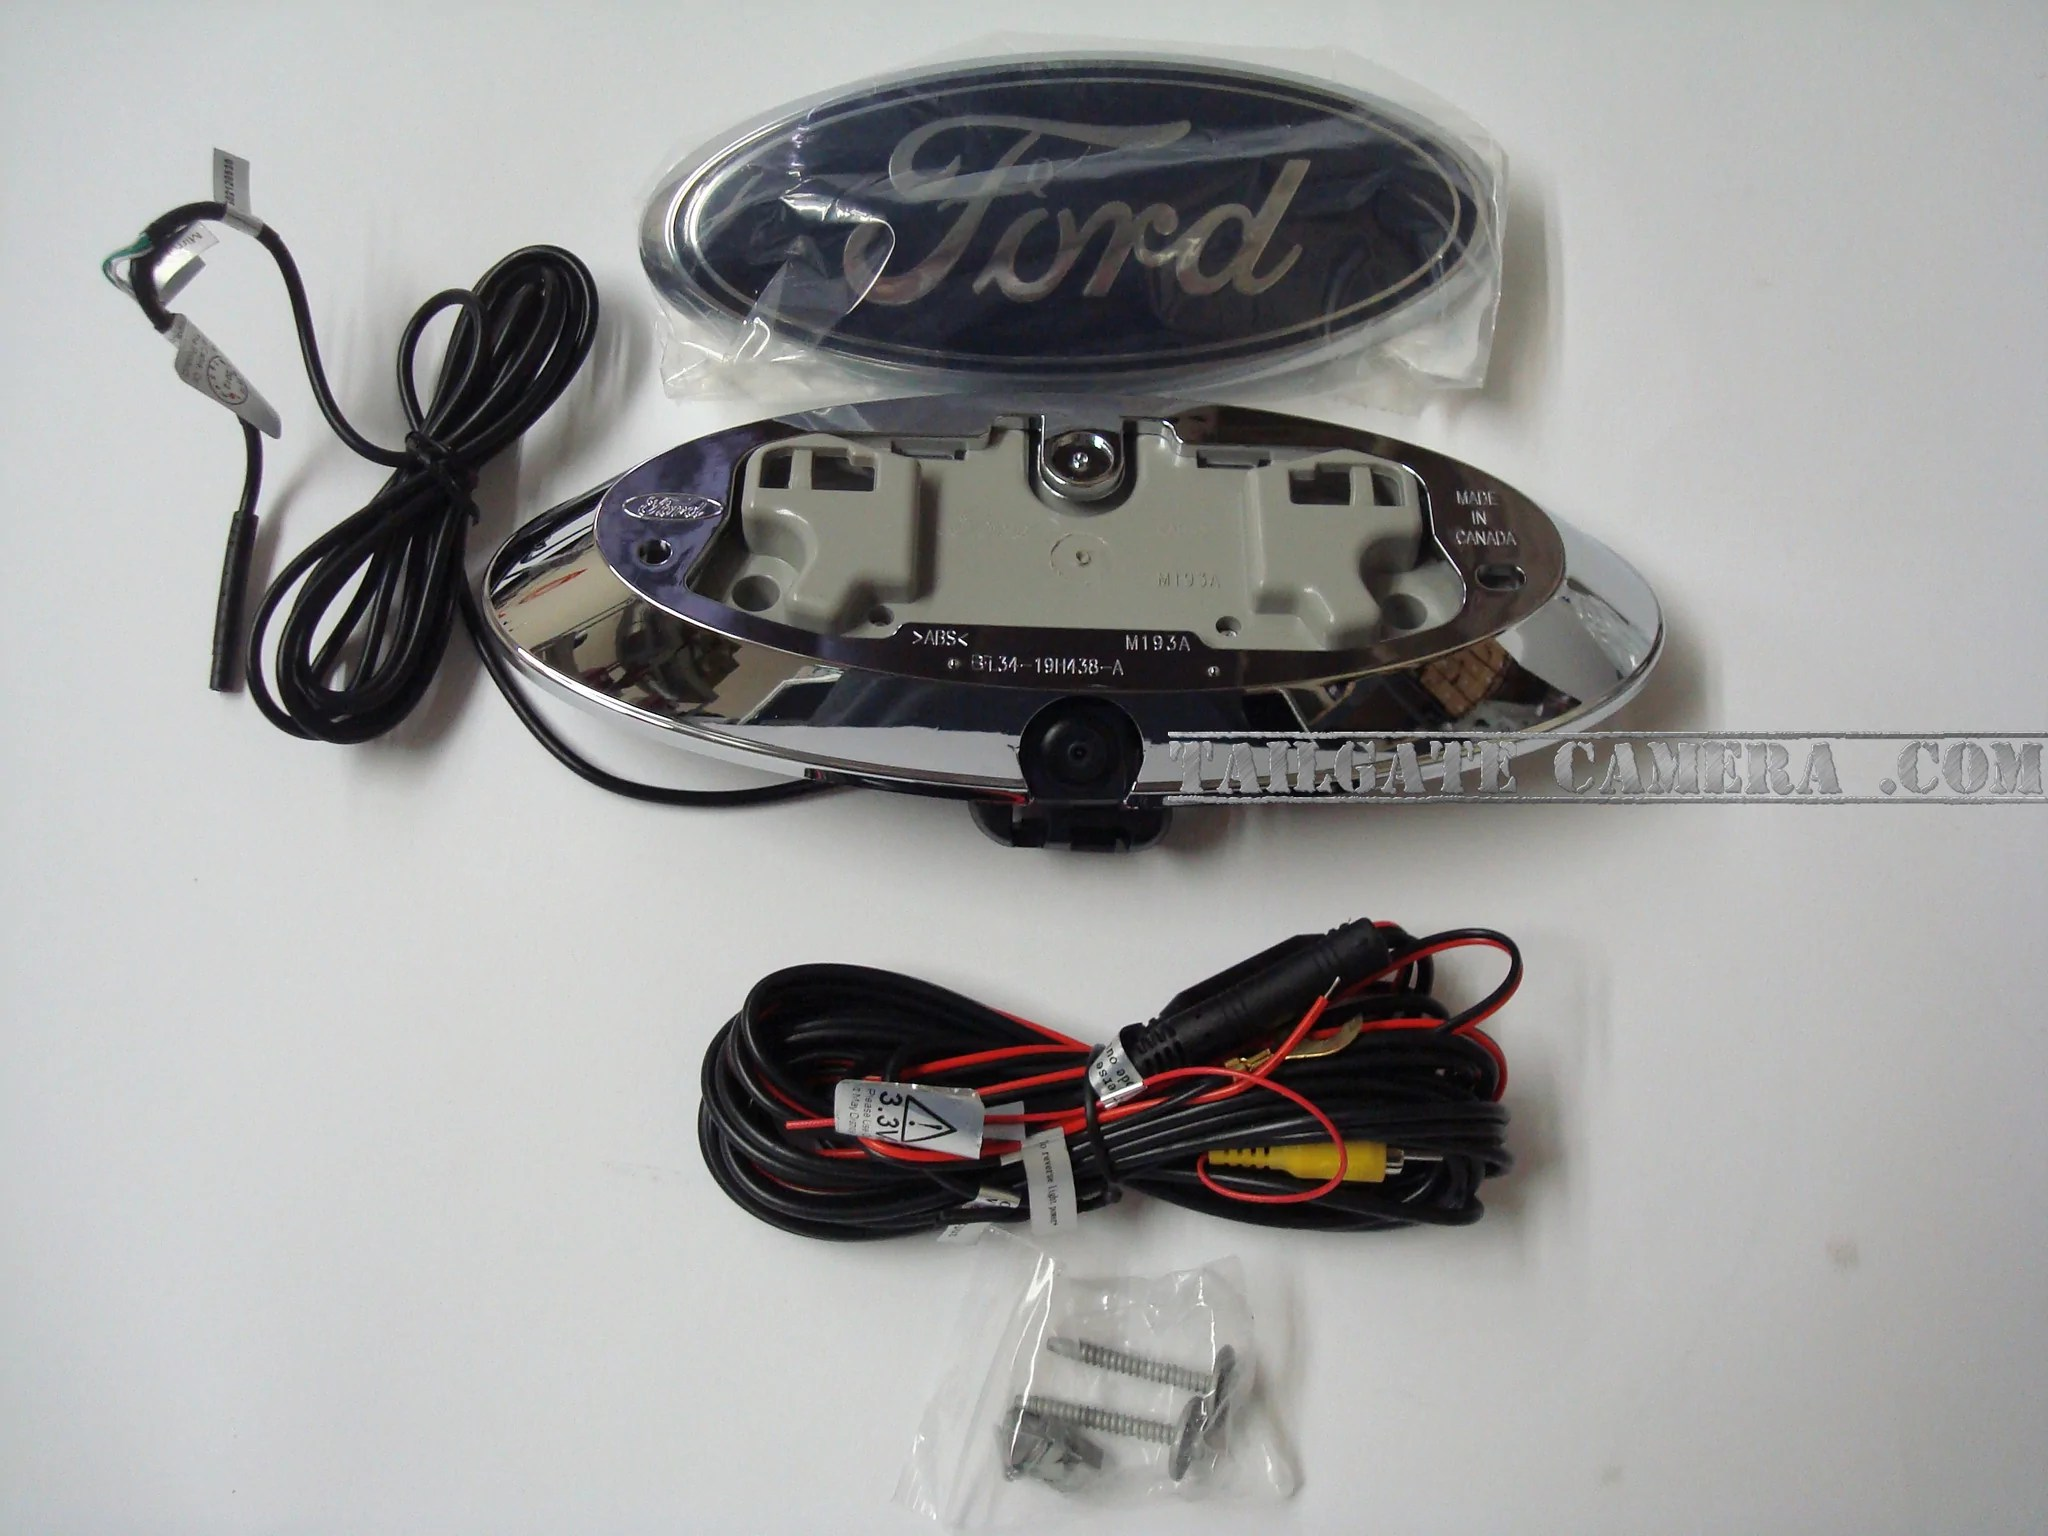 small resolution of ford f series truck emblem camera